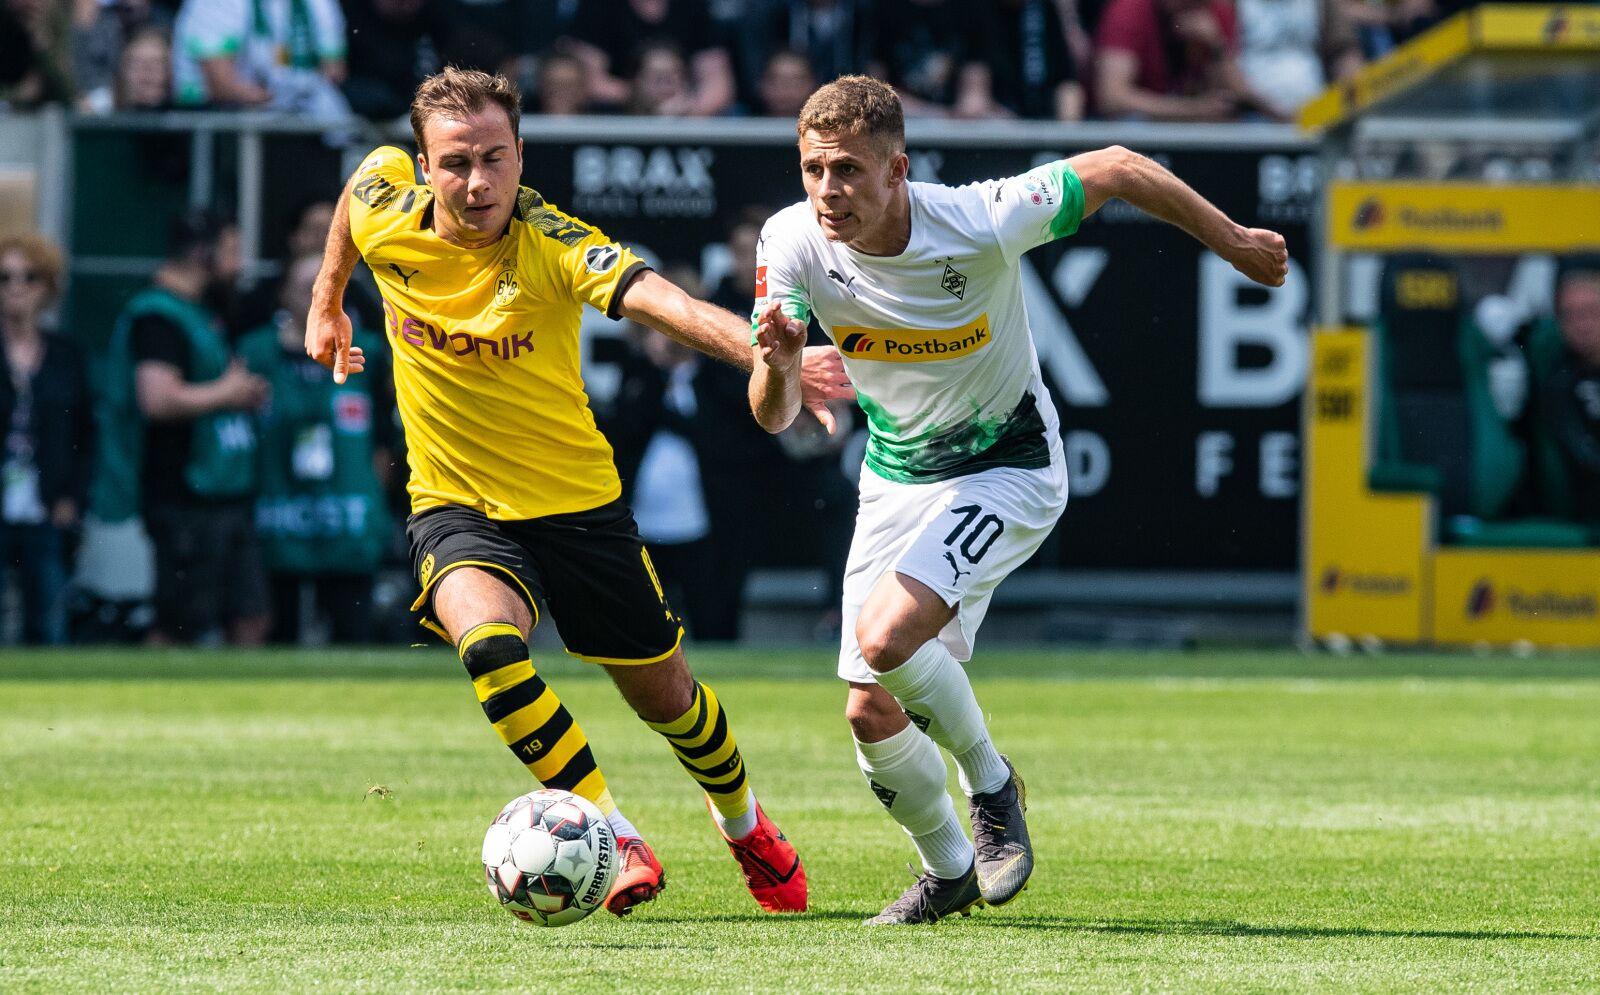 Borussia Dortmund sign Thorgan Hazard for 25 million euros